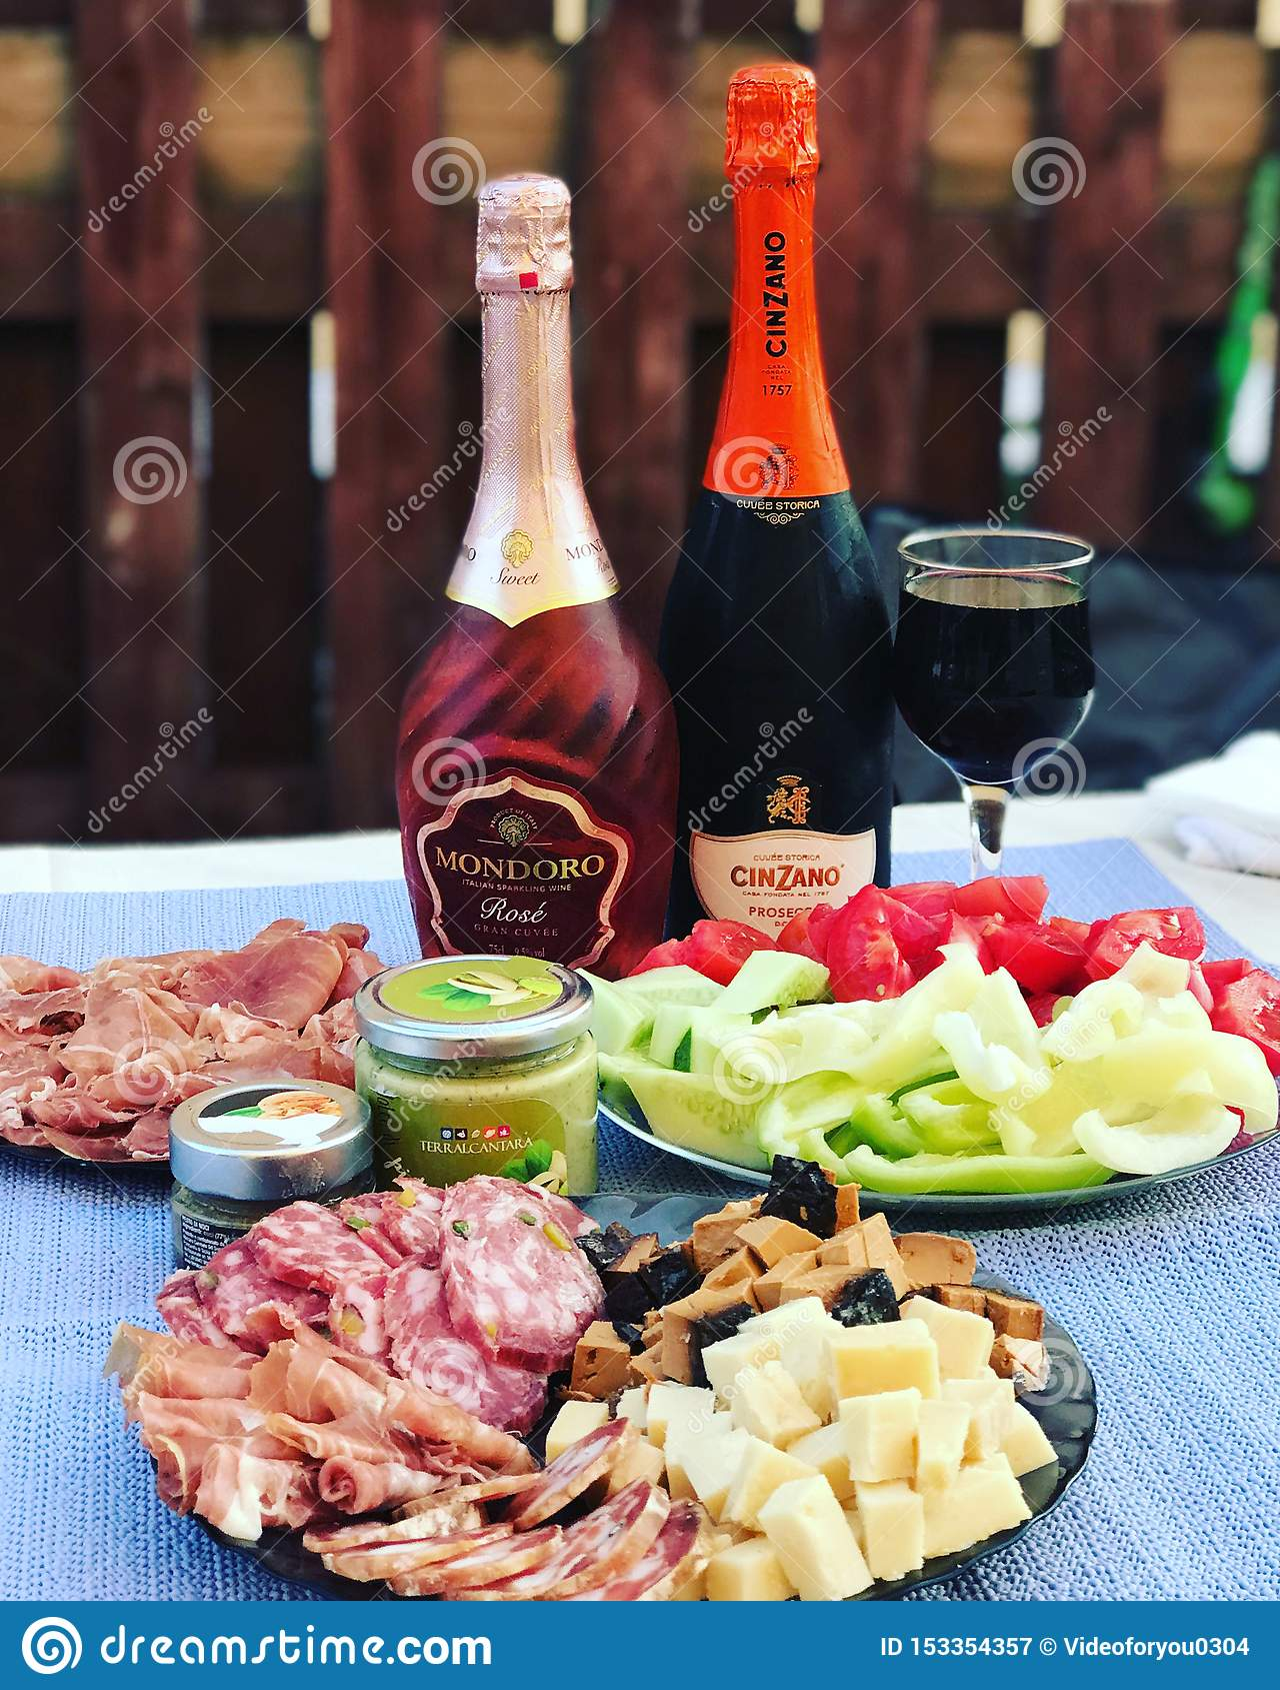 Russia, Tatarstan, July 27, 2018. A bottle of Cinzano proseco, a bottle of Mondoro rose, snacks: jamon, cheese, pesto, vegetables